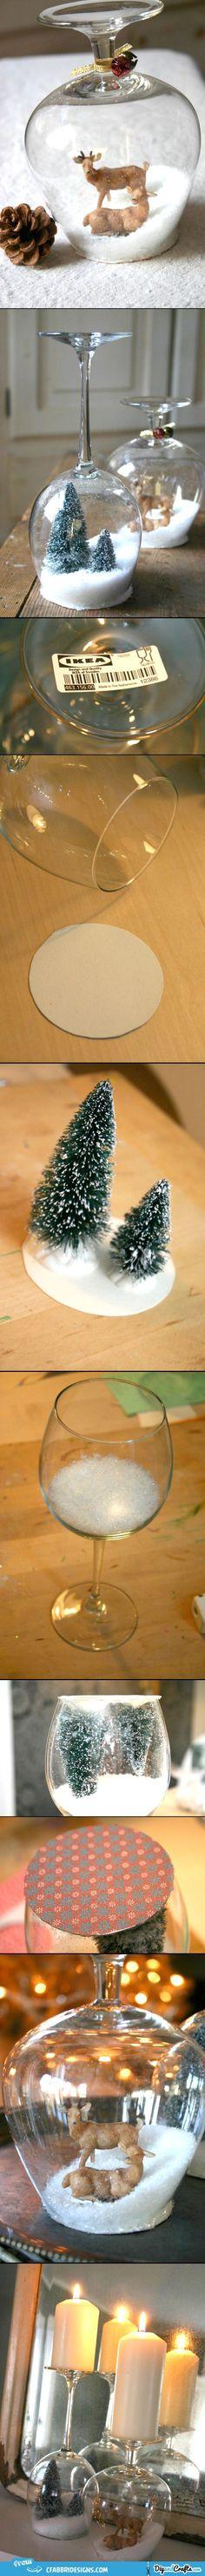 Diy Crafts Ideas : DIY Stemware Snow Globes